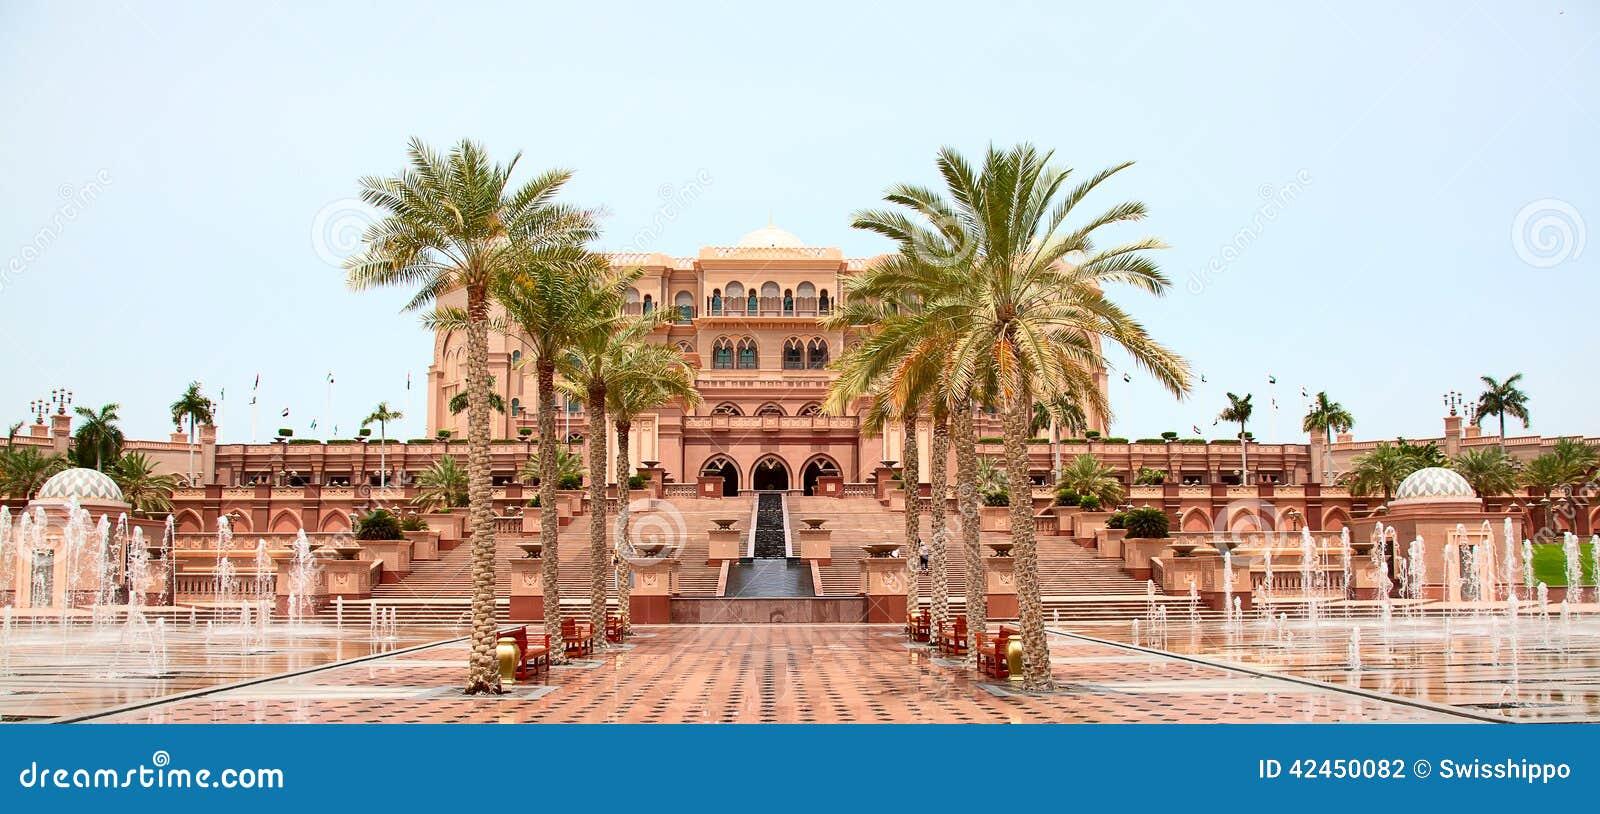 Emirat-Palast Nacht